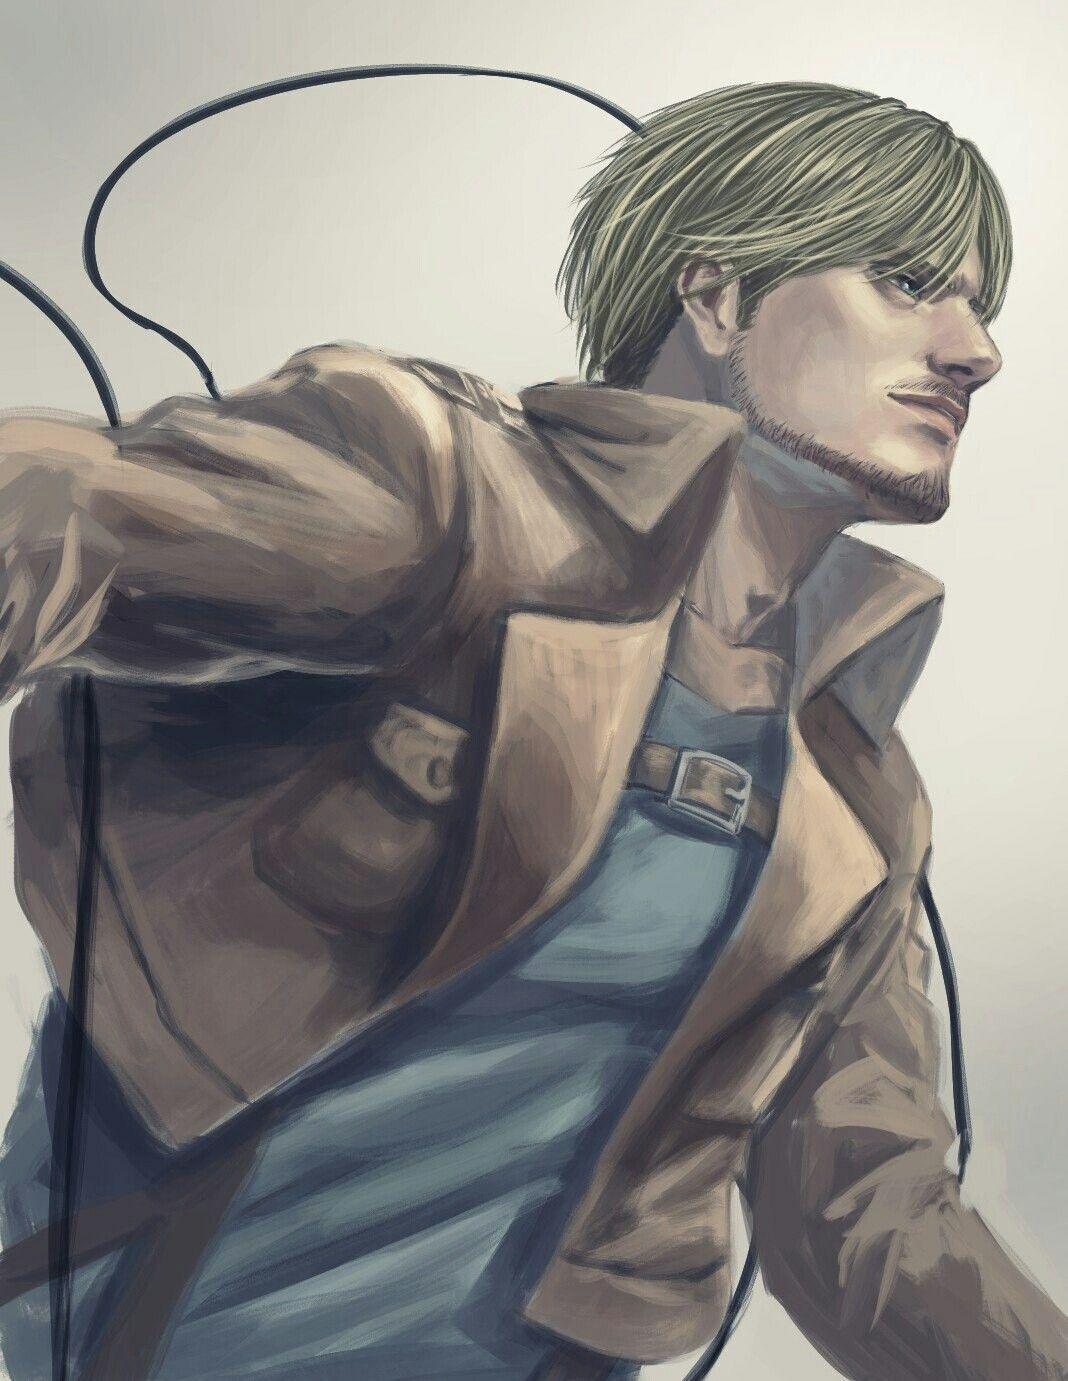 Pin by Scottyrose on Shingeki no kyojinAttack of the TitansАтака титанов進撃の巨人   Attack on ...